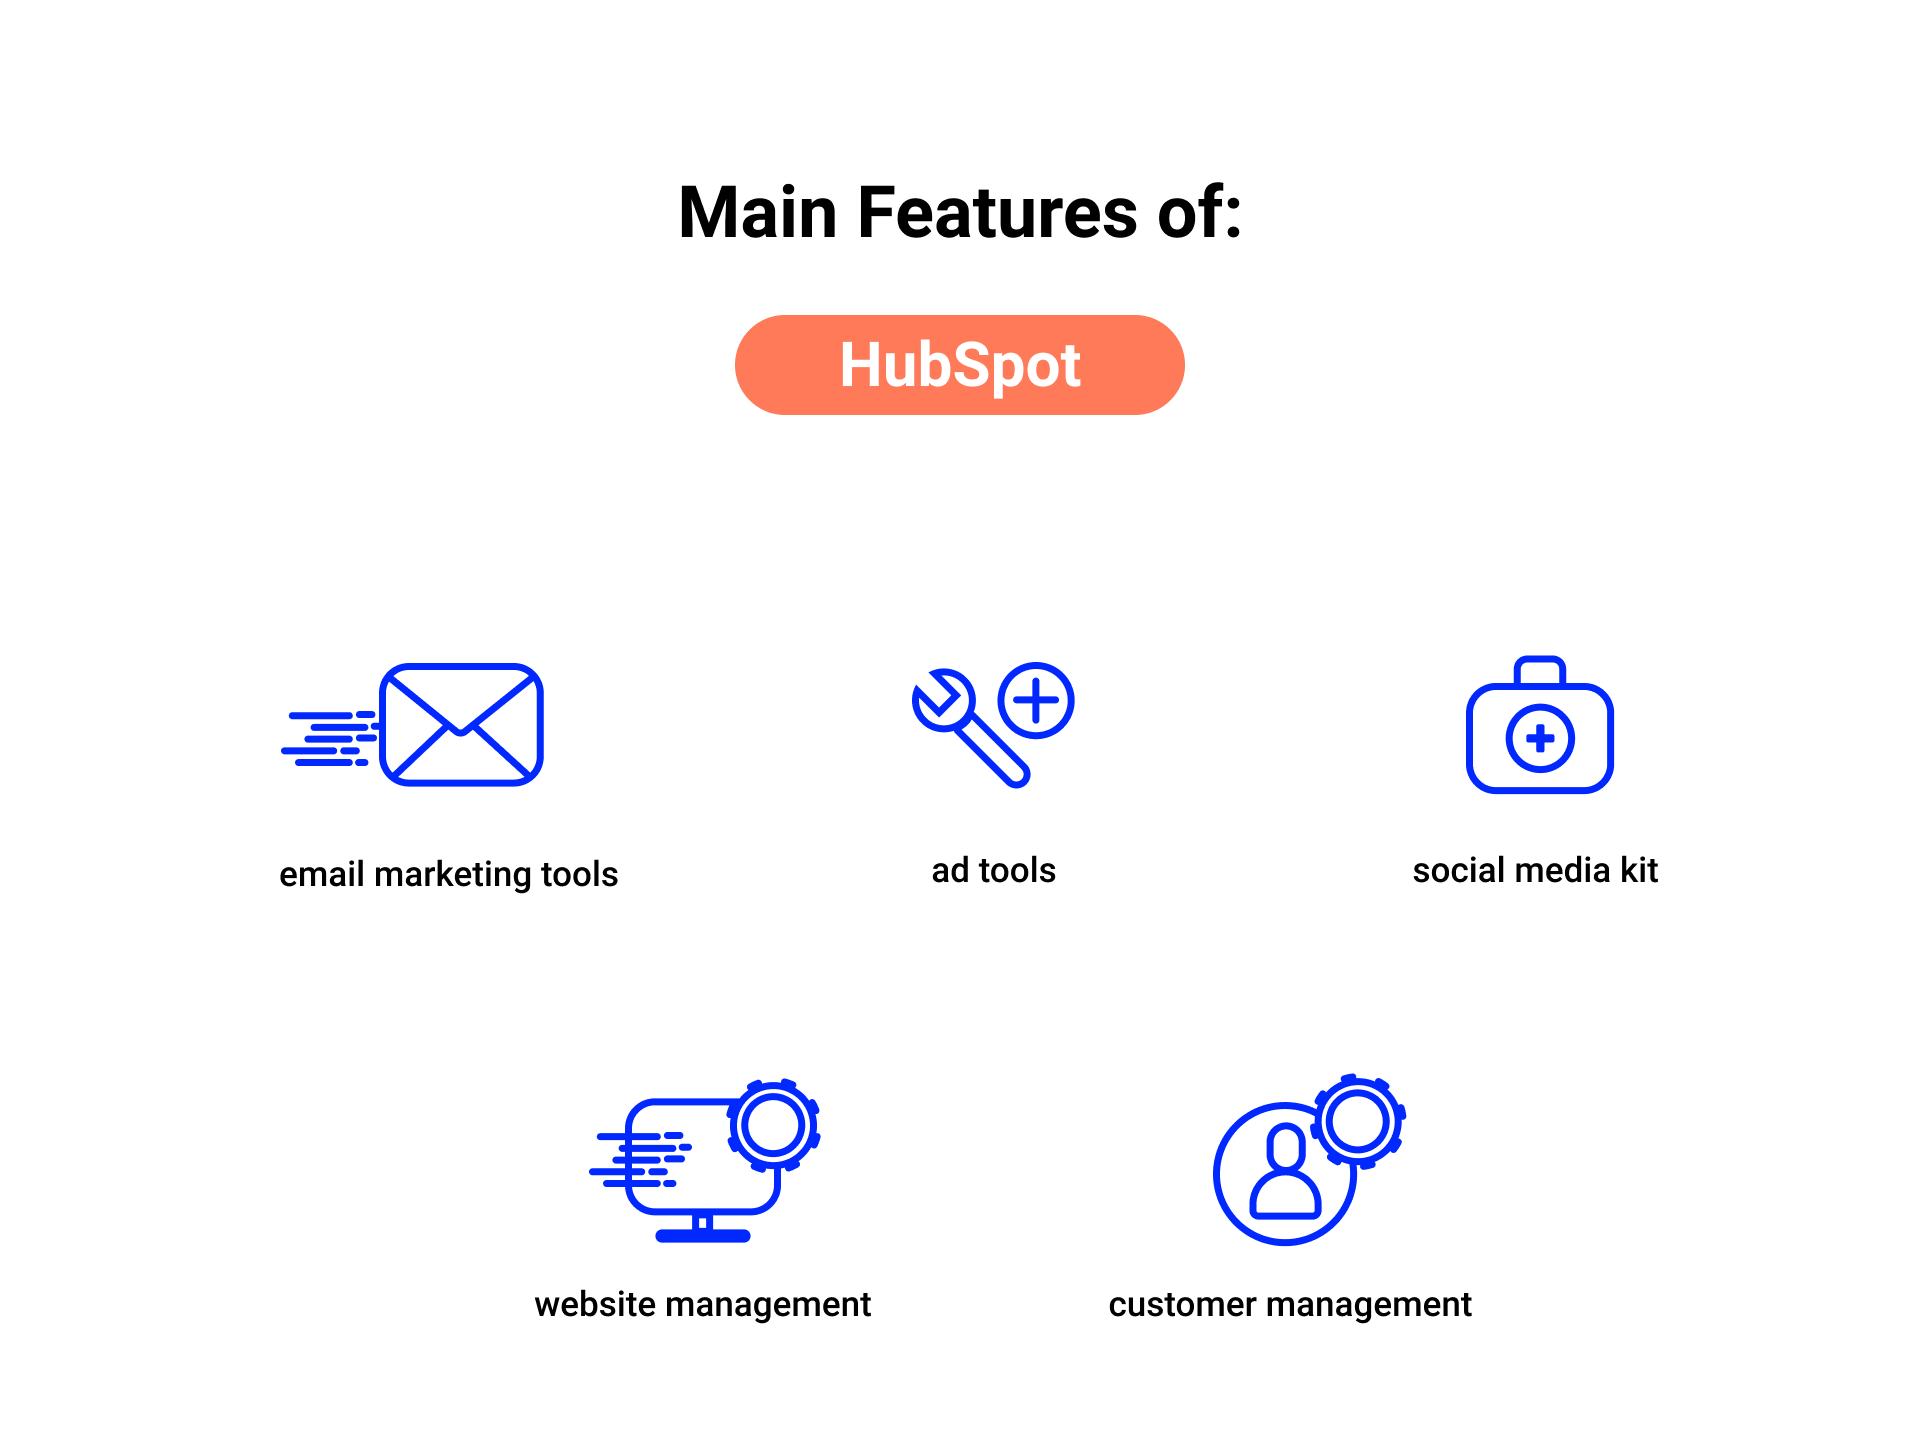 main features of hubspot